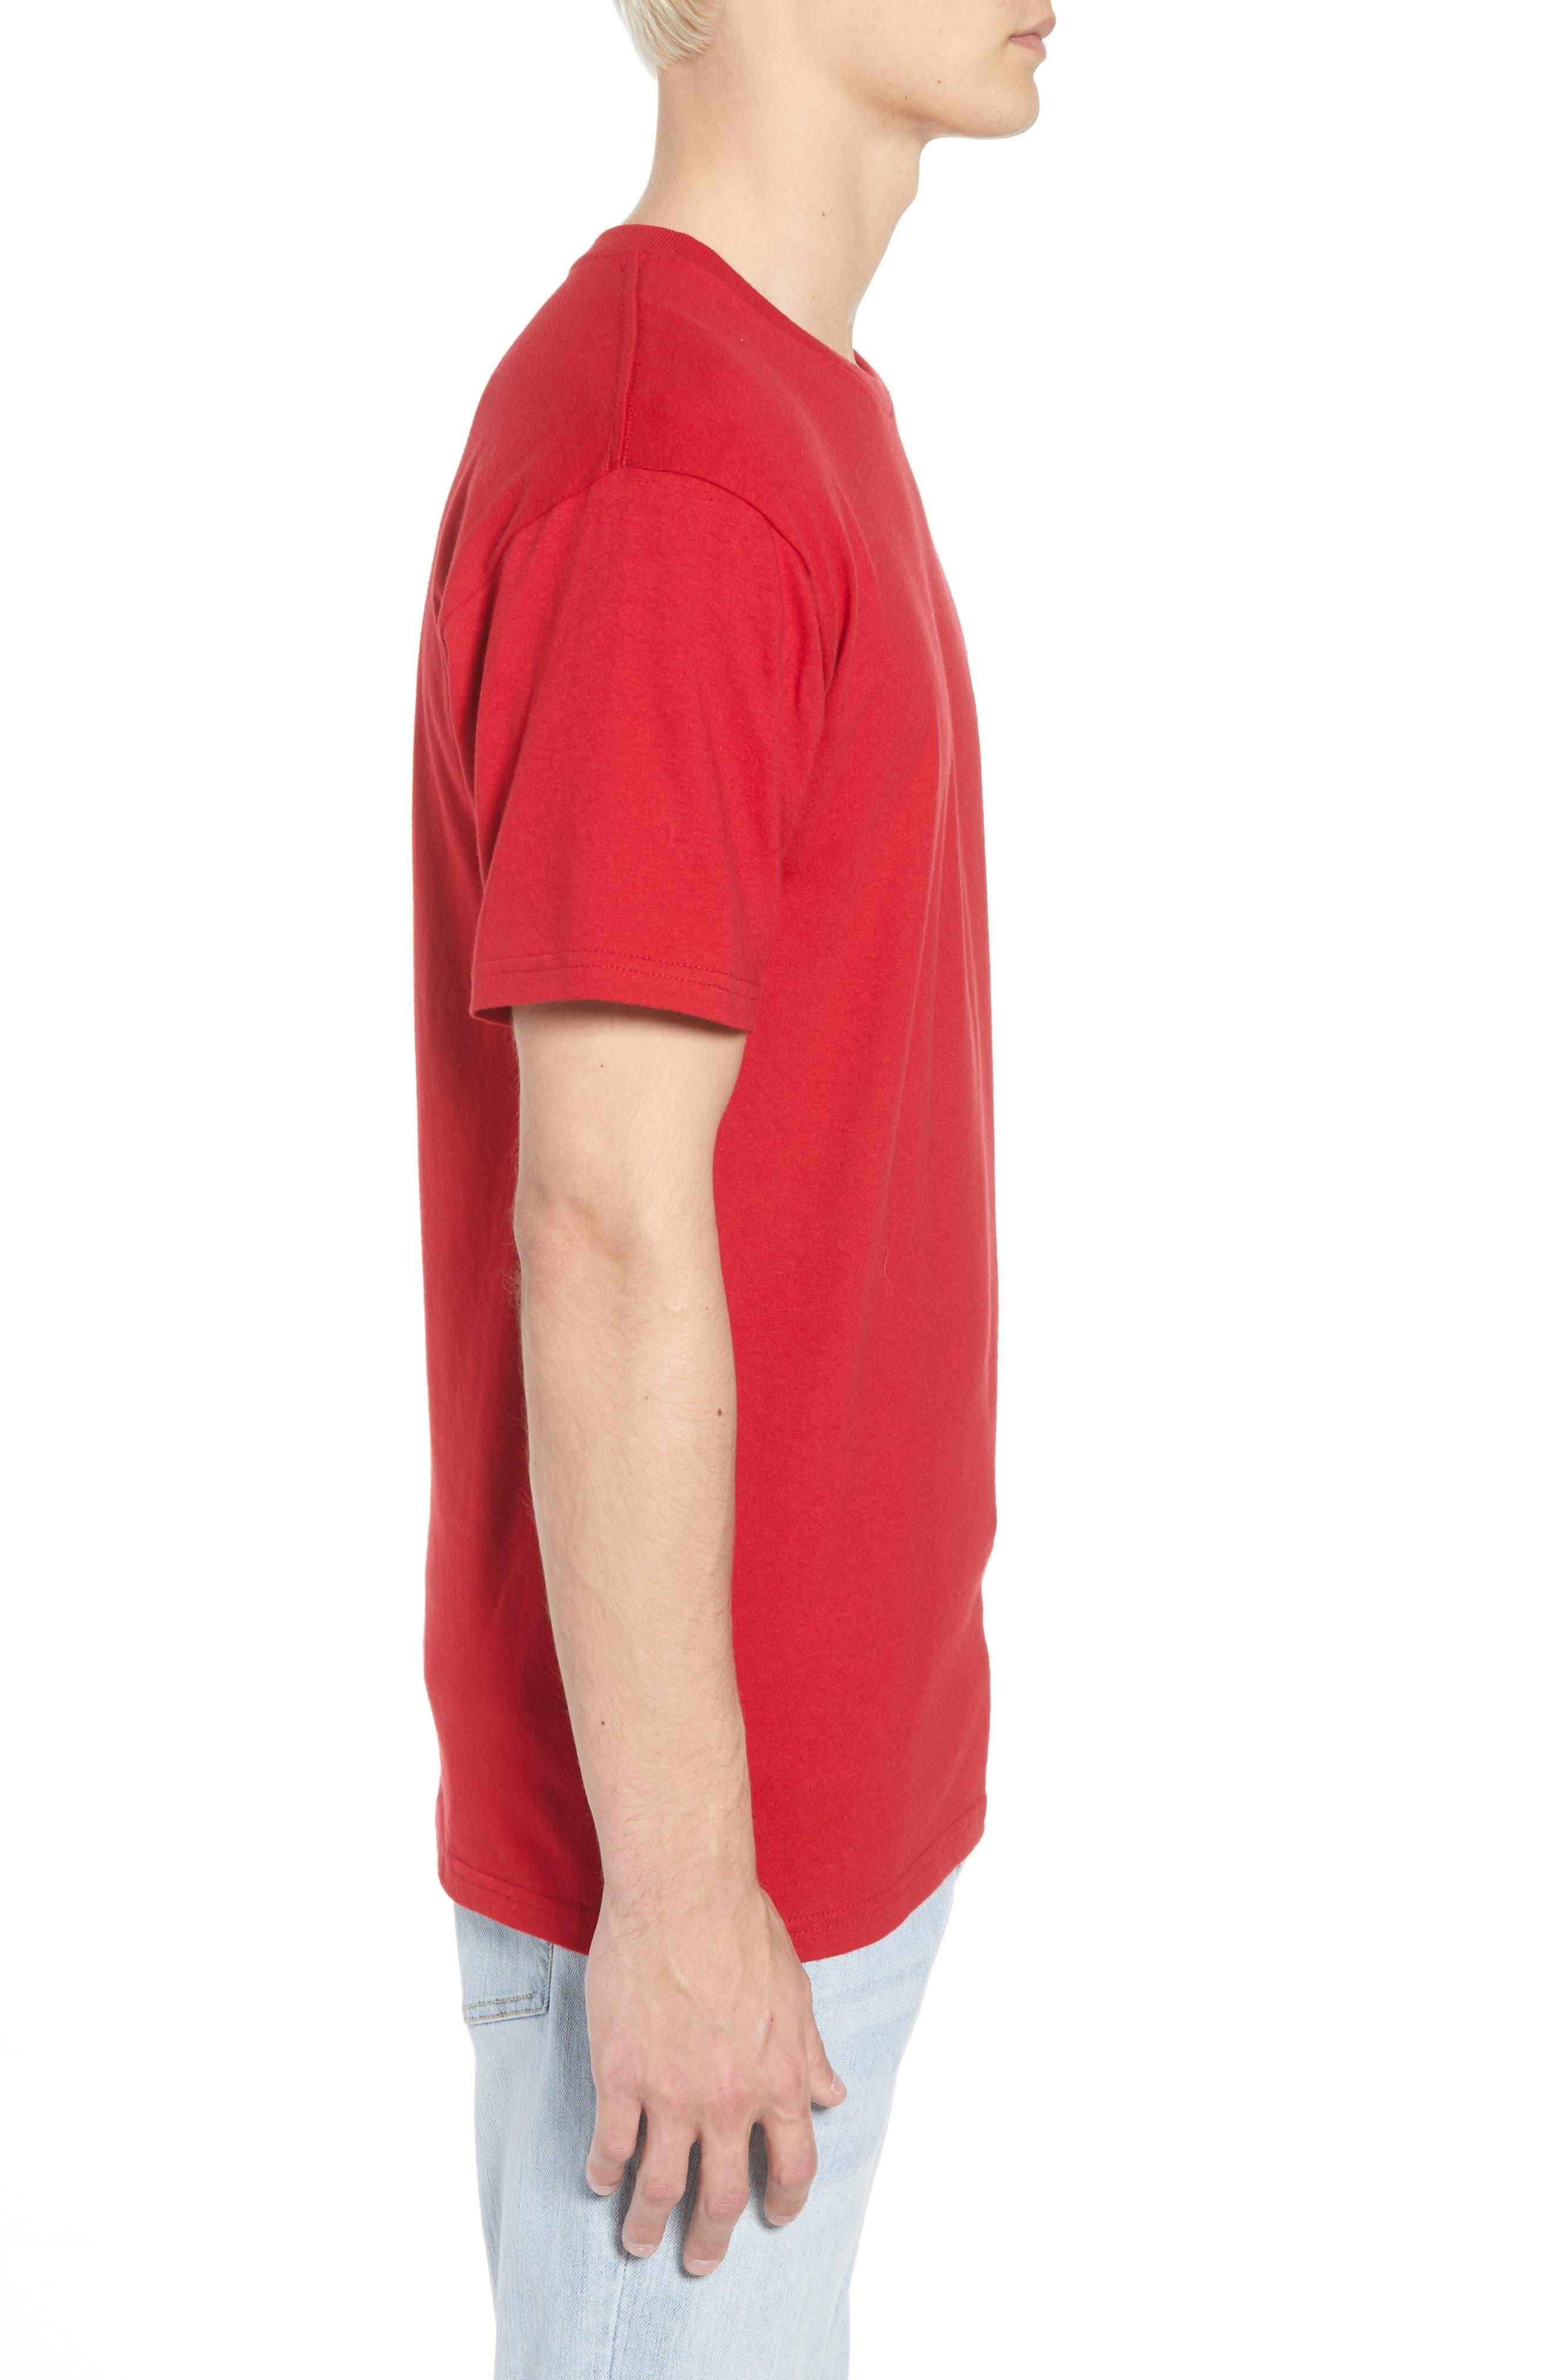 x Marvel<sup>®</sup> Iron Man T-Shirt,                             Alternate thumbnail 3, color,                             601